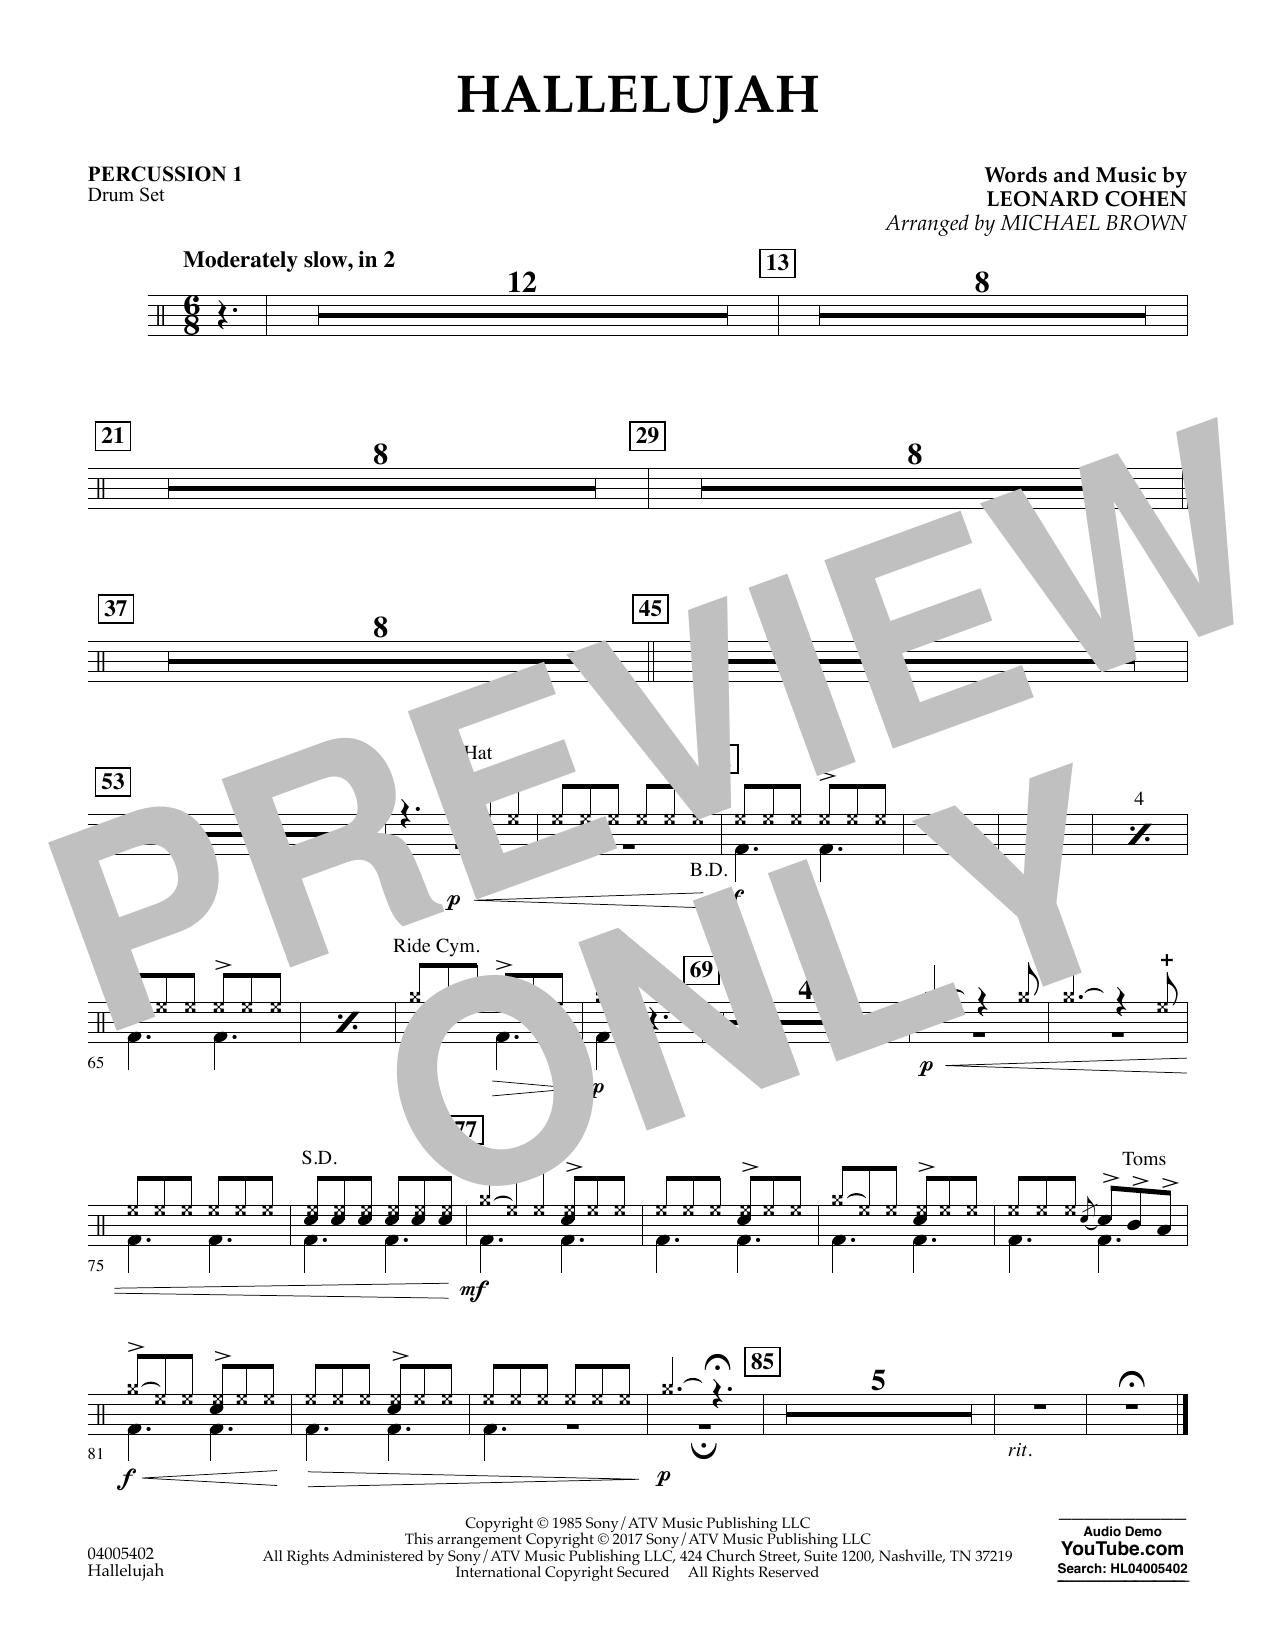 Hallelujah - Percussion 1 (Flex-Band)